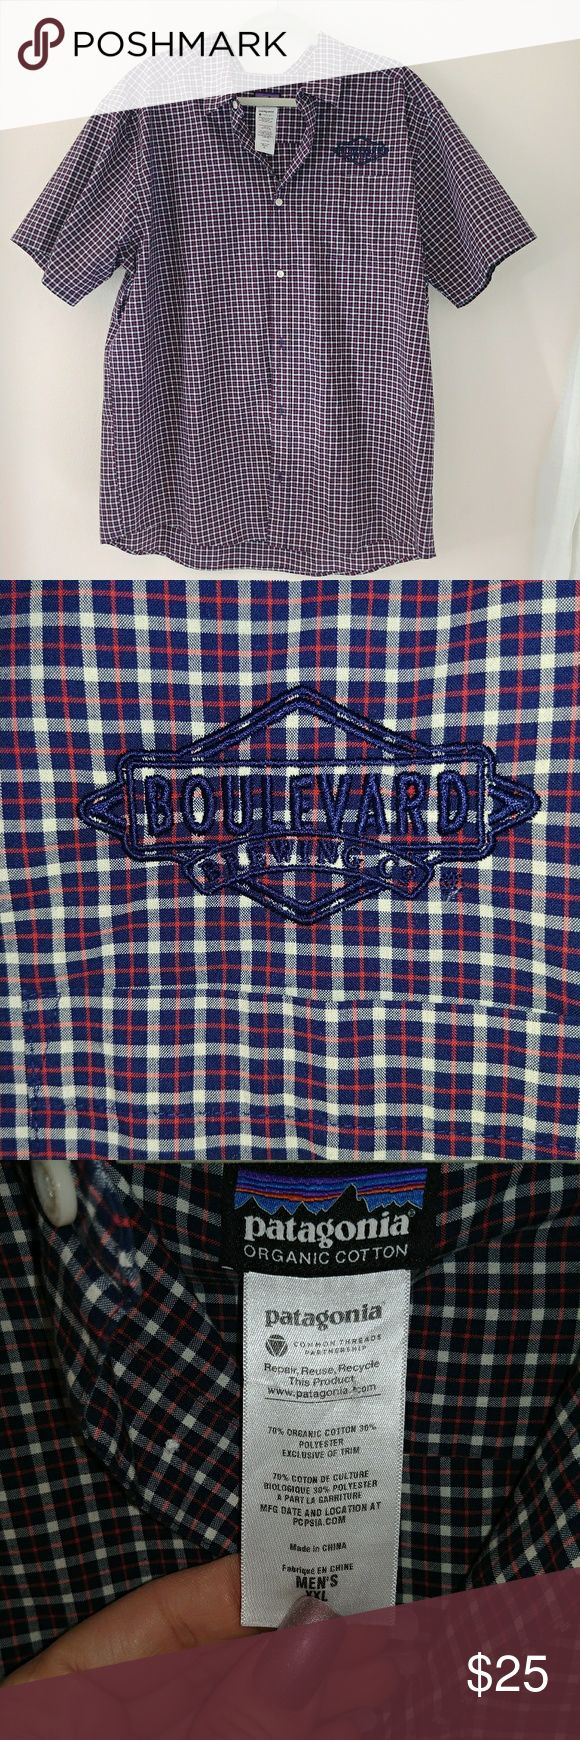 Shirt design kansas city - Mens Xxl Patagonia Shirt Boulevard Brewing Co Kansas City Mo Patagonia Shirts Casual